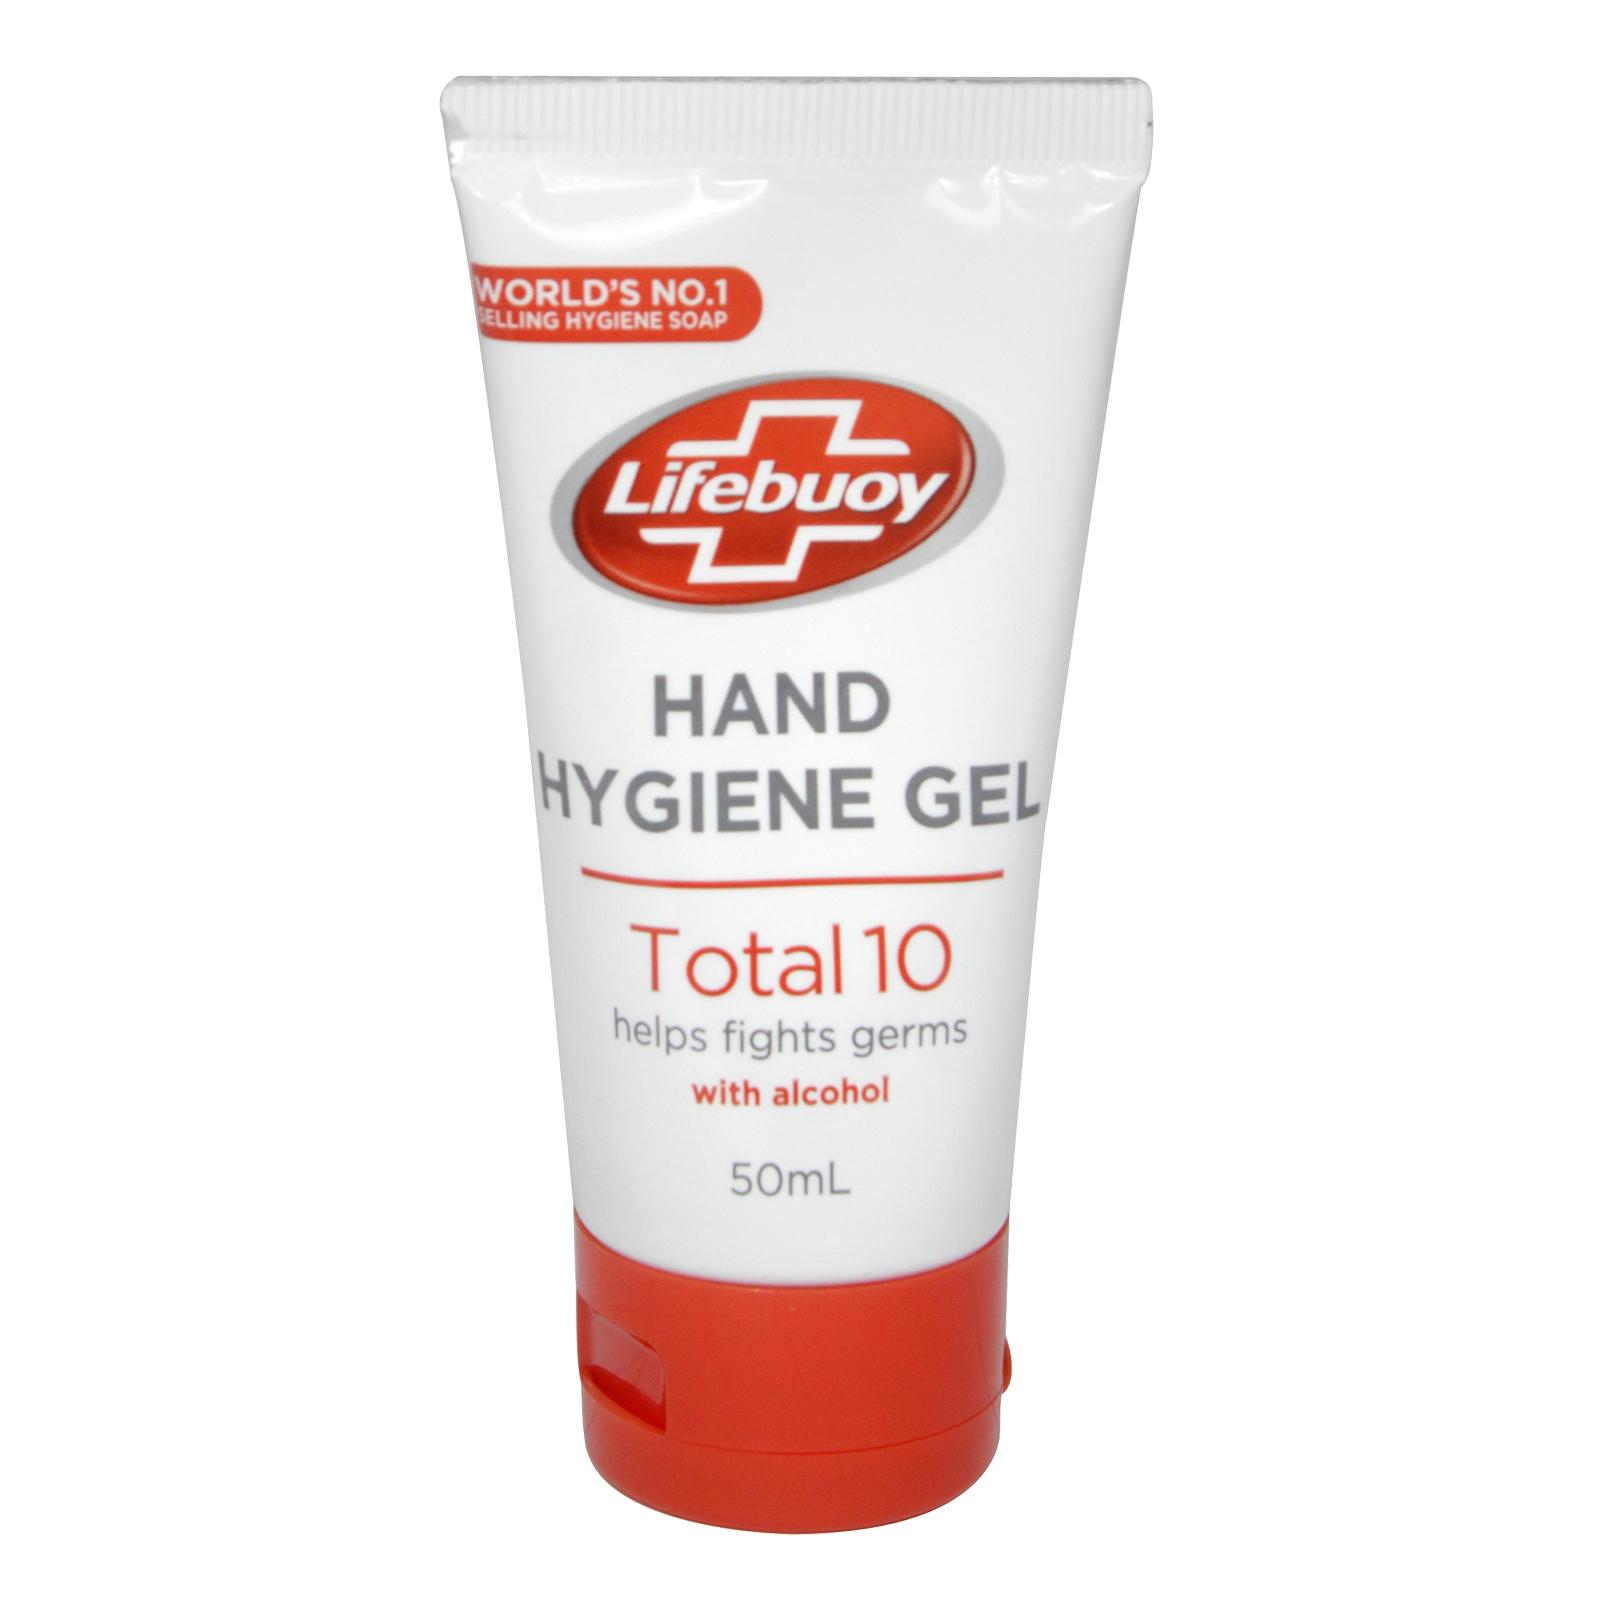 LIFEBUOY HAND HYGIENE GEL TOTAL 10 WITH ALCOHOL 50ML